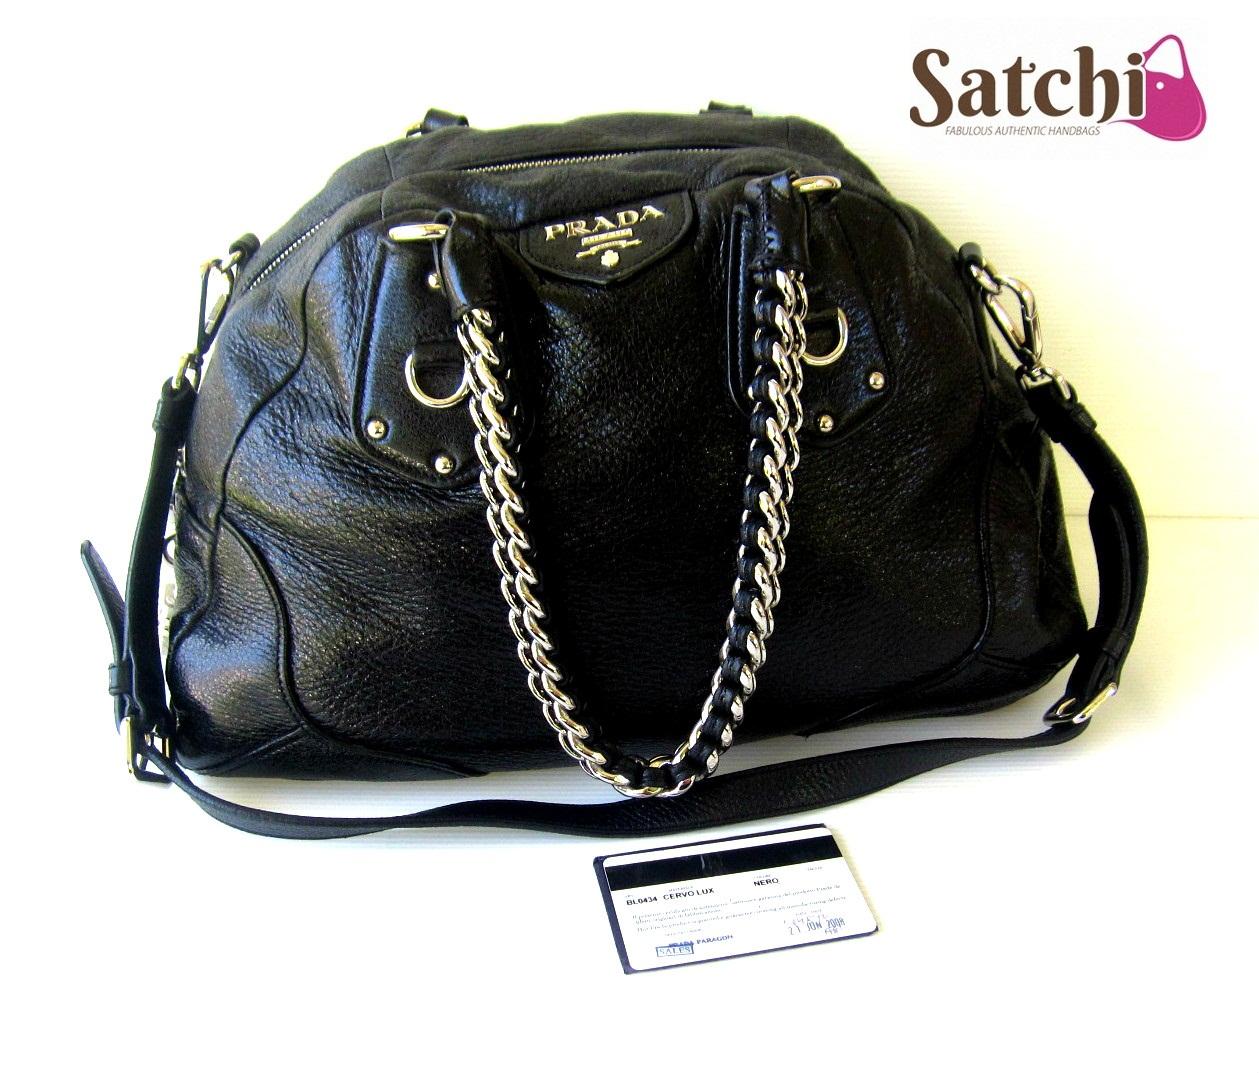 acabe7c2ebbe Satchi   SOLD  Prada BL0434 Cervo Lux Nero 2008